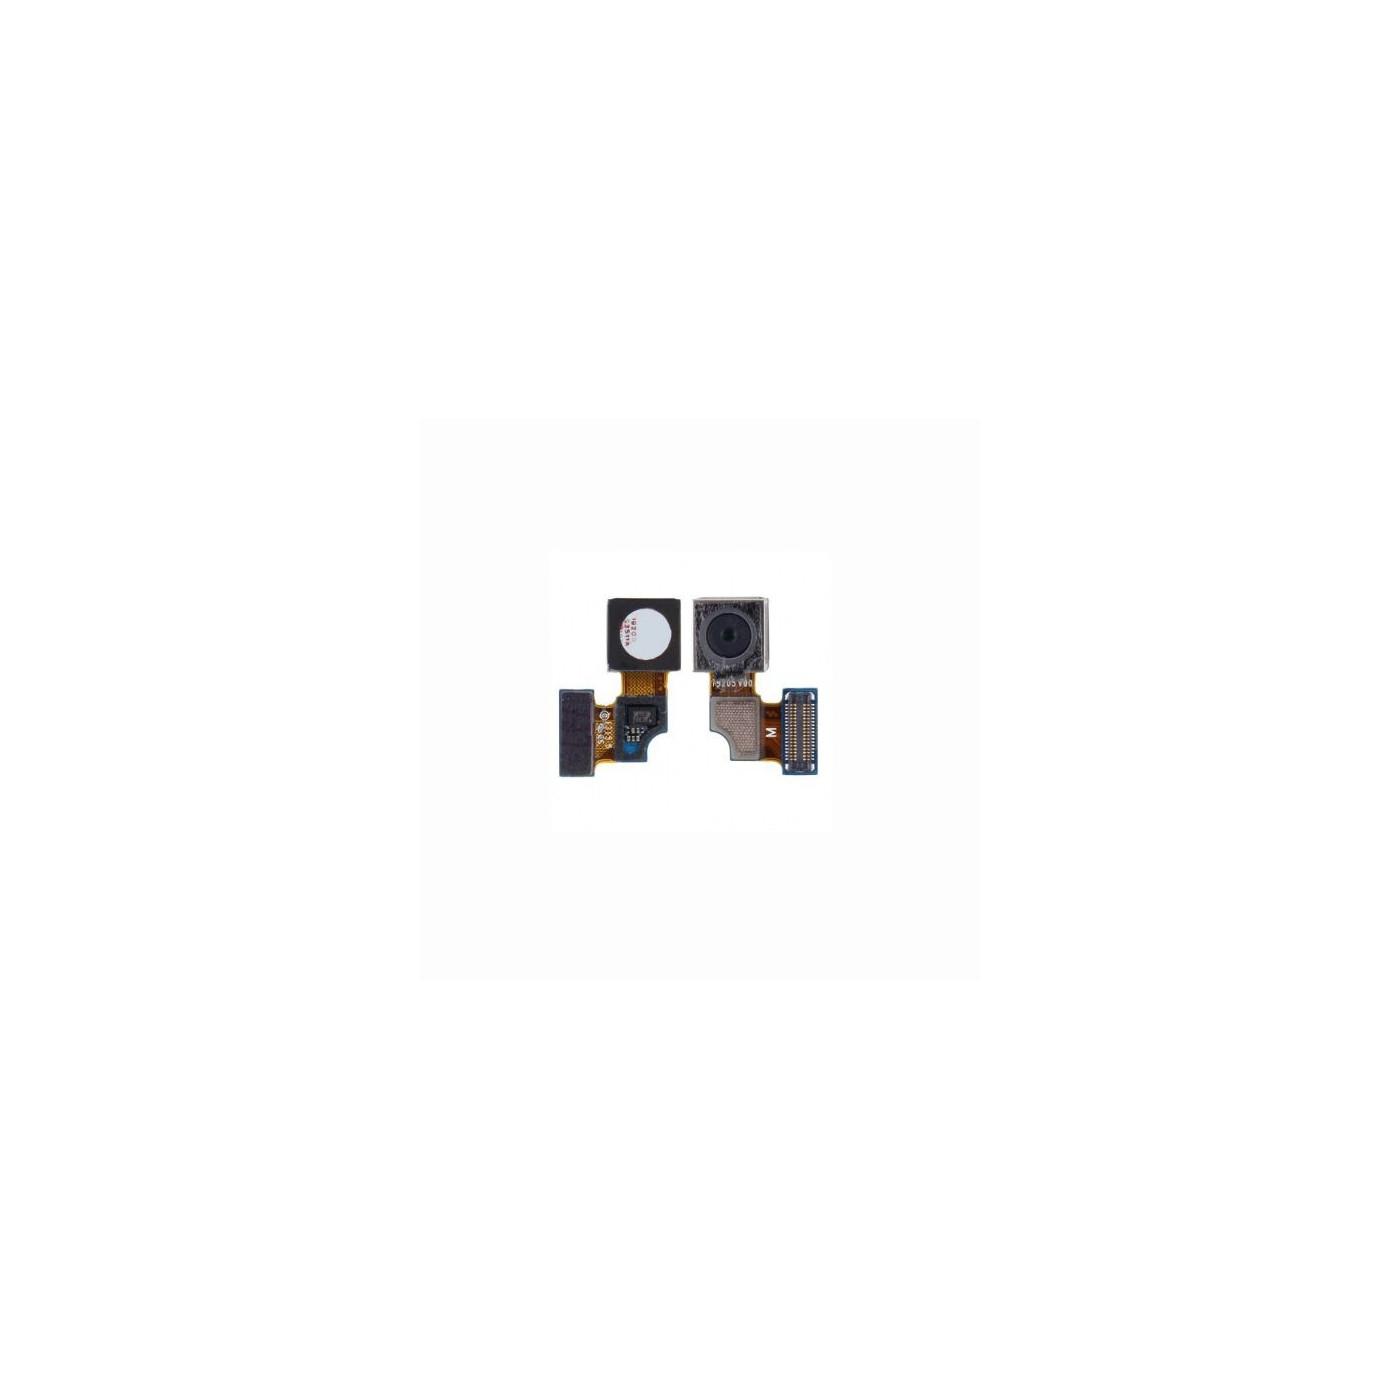 Cámara trasera para cámara plana Samsung Galaxy Mega 6.3 GT-I9200